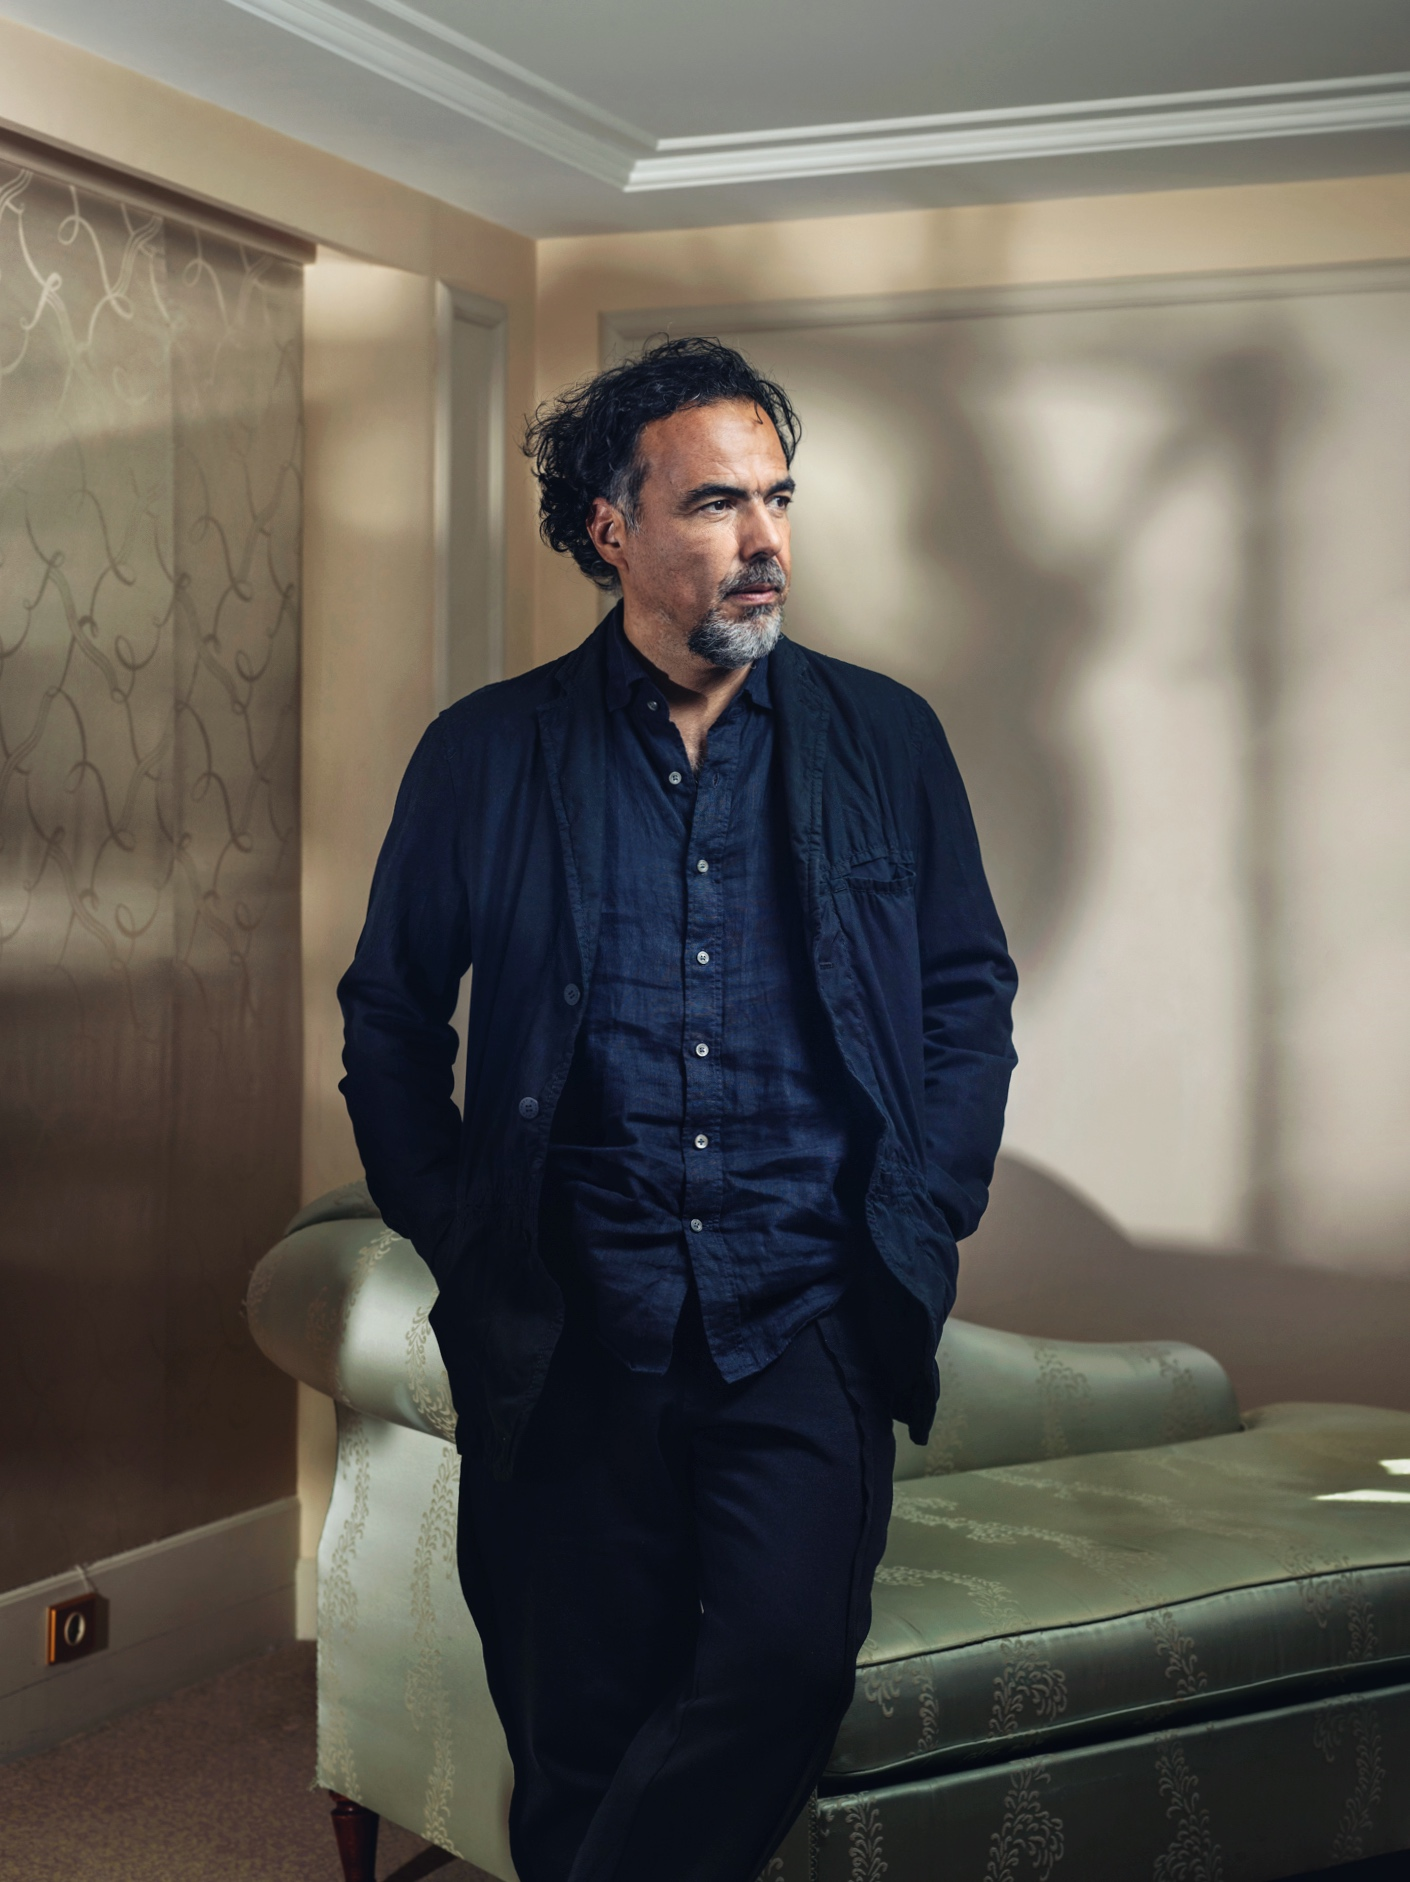 Director Alejandro González Iñárritu for le Monde